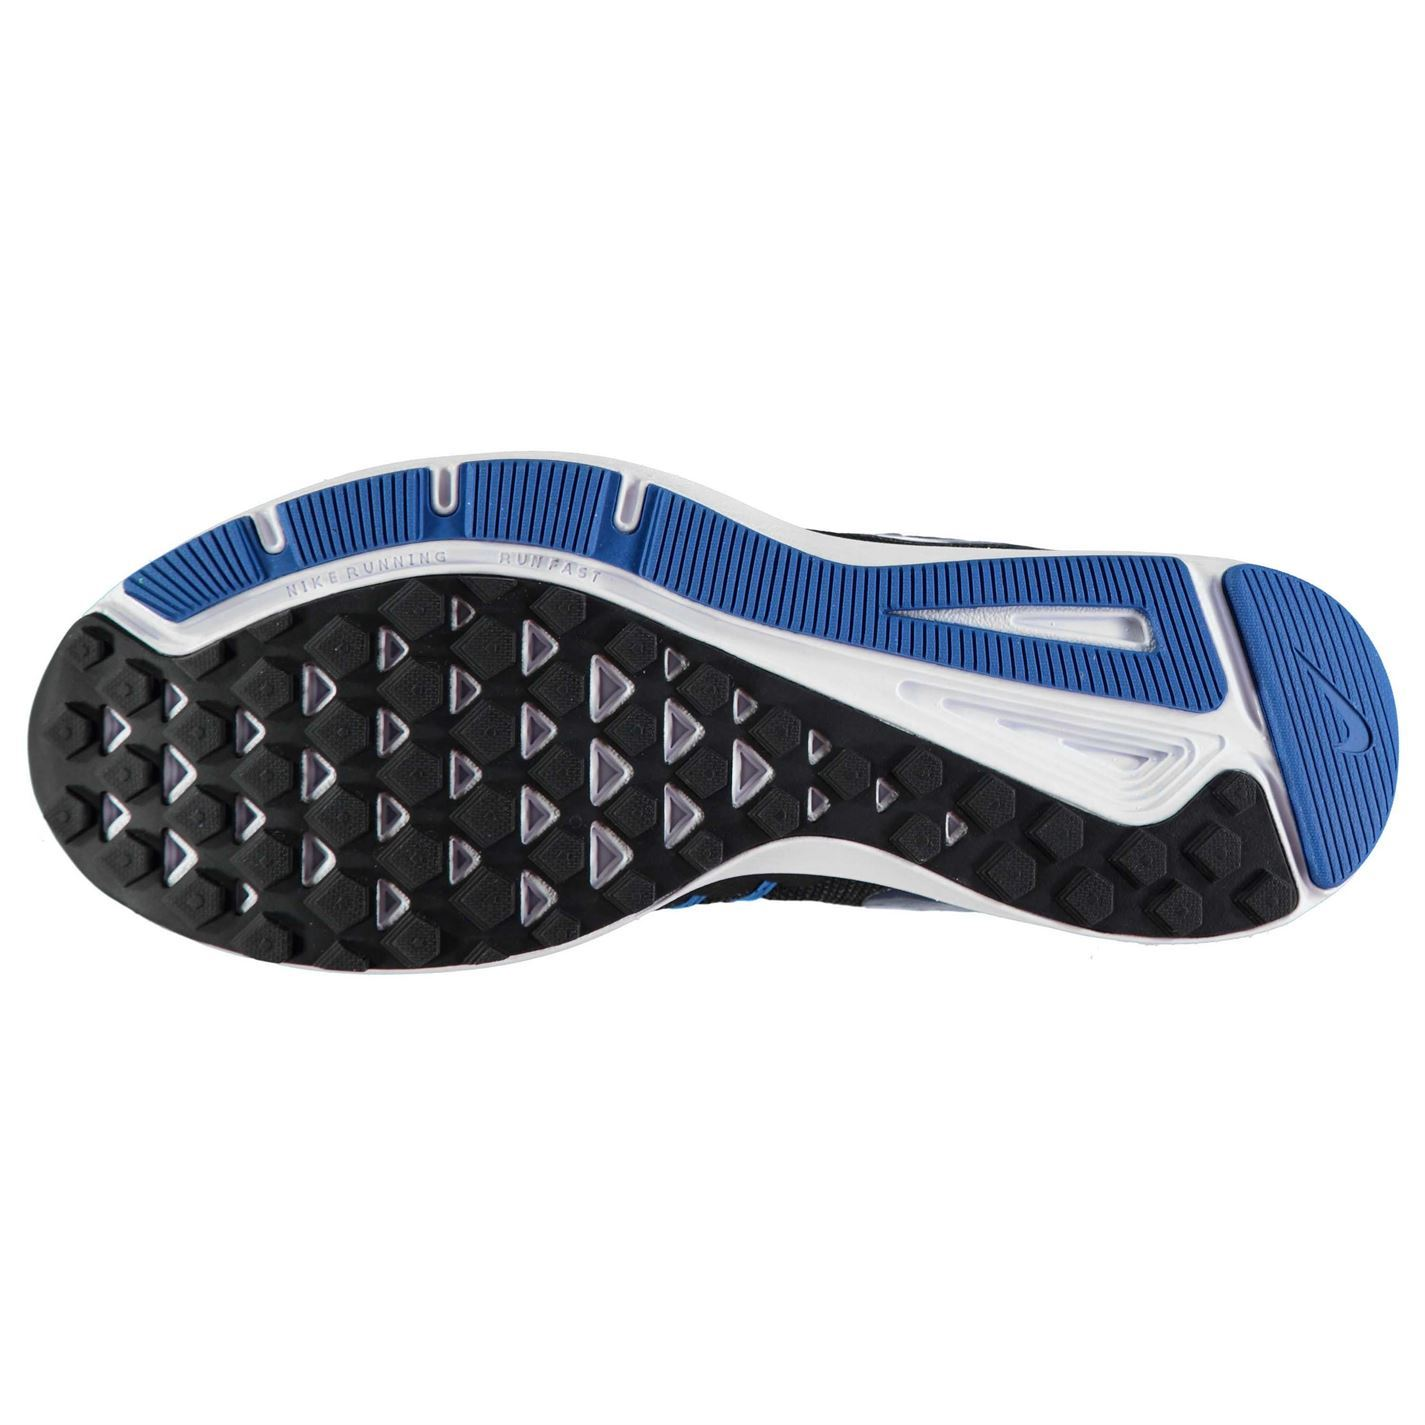 9ebf3dba8 ... Nike Run Swift Runners Running Shoes Mens Anthracite Navy Trainers  Sneakers ...